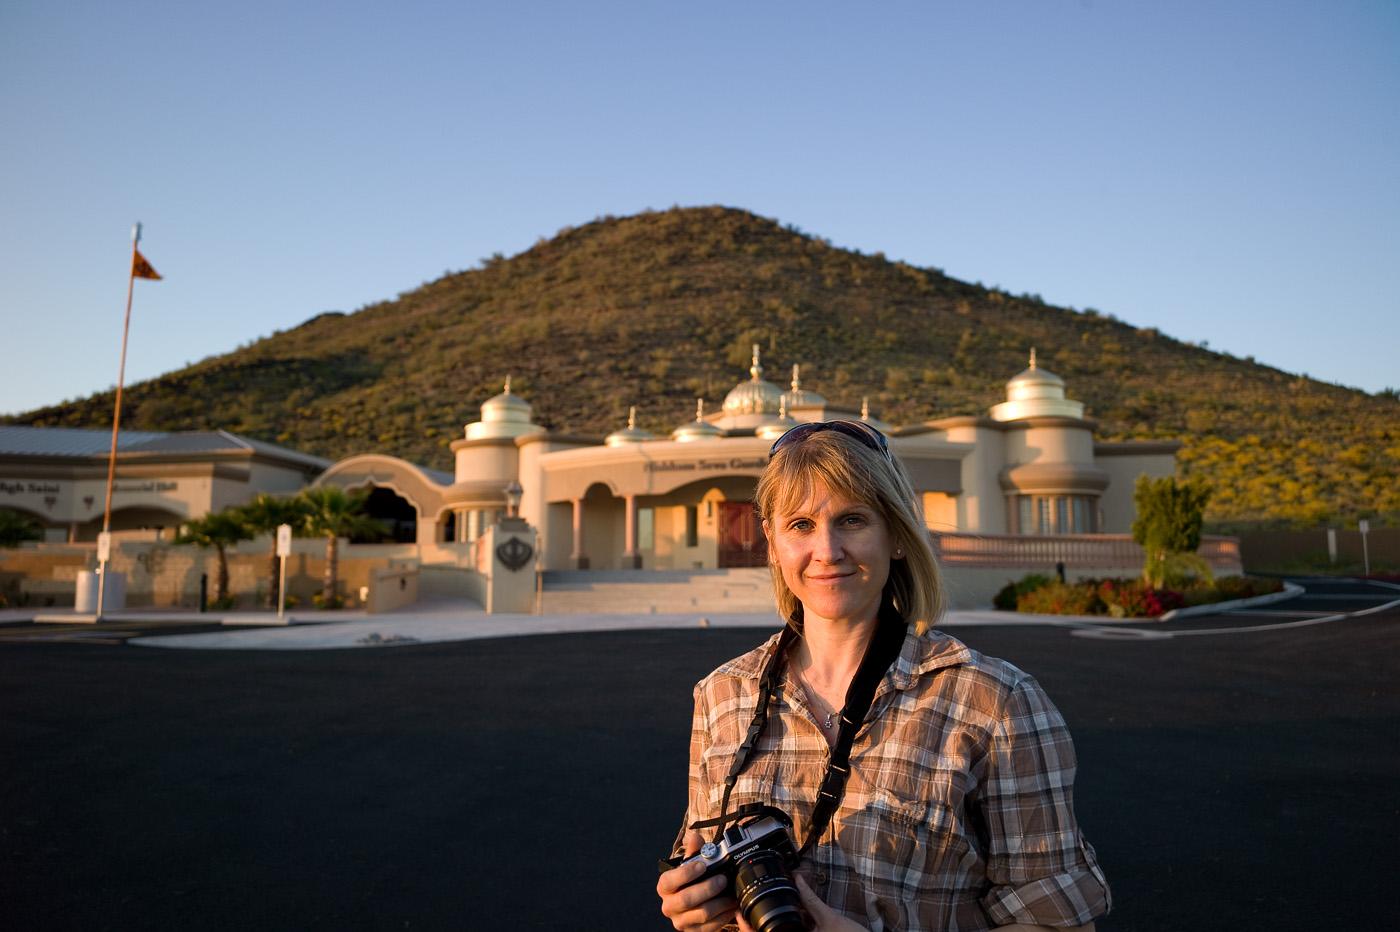 The Leica 24 Elmar 3 8 Lens Review | Steve Huff Photo